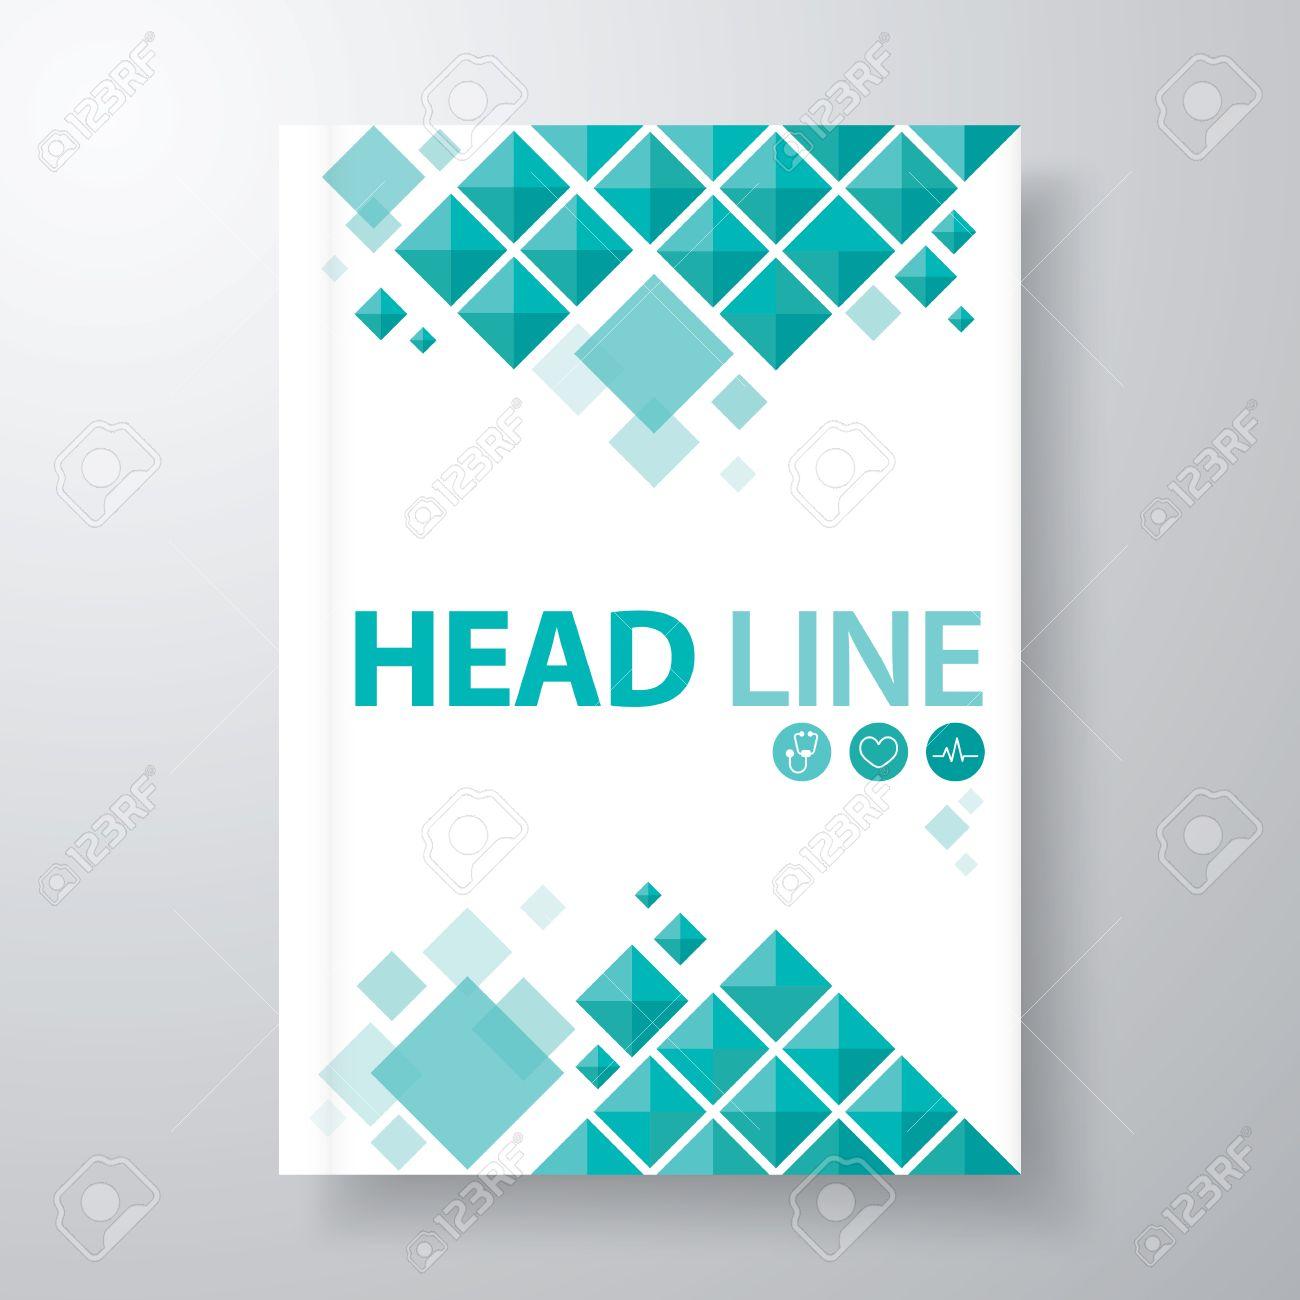 report cover design templates